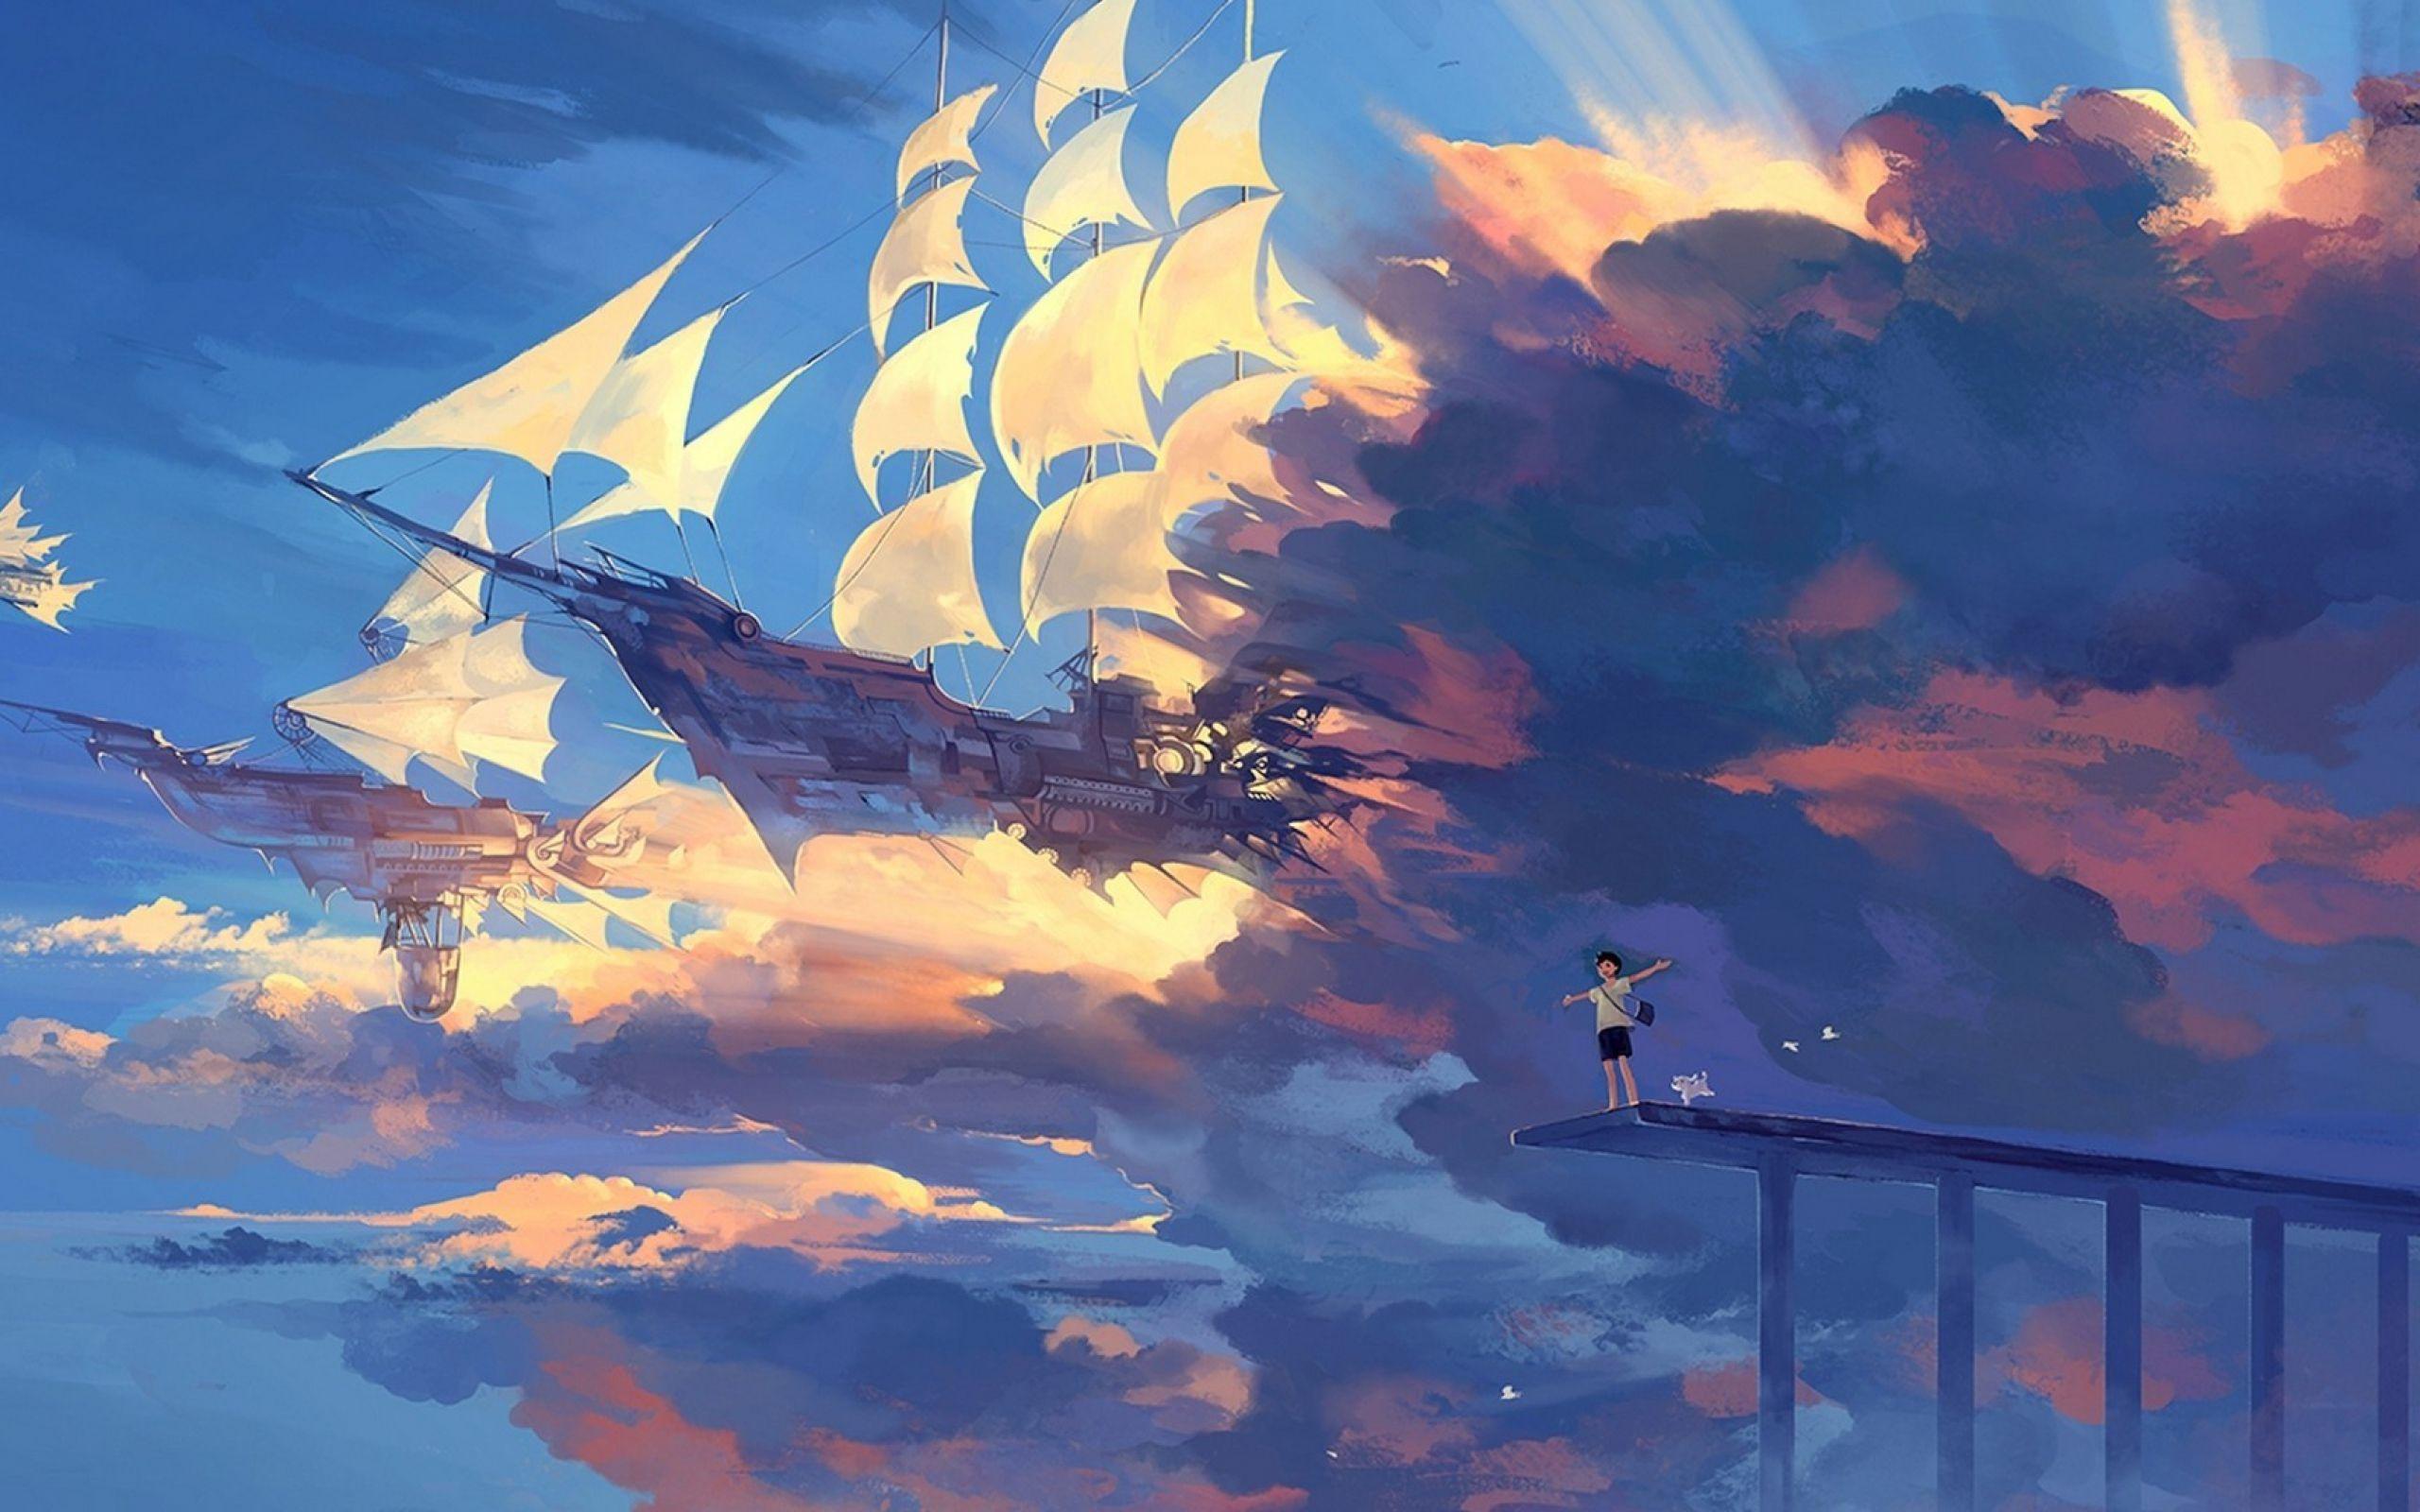 Anime Sky Wallpaper for Desktop 2560x1600 px 1.00 MB